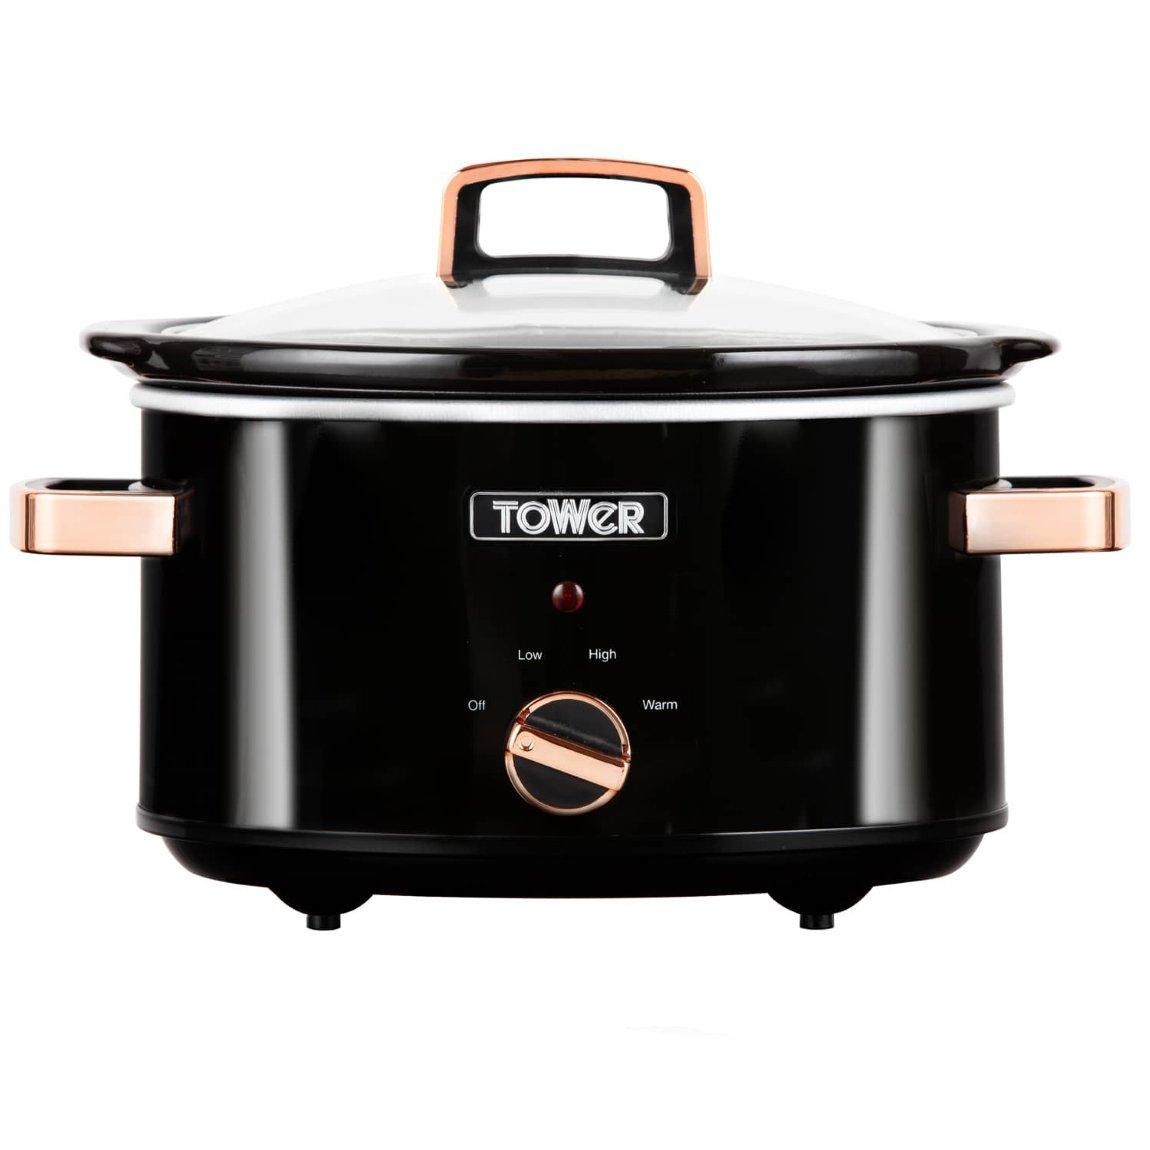 Tower 3.5L Slow Cooker - Black & Rose Gold £18 @ B&M BARGAINS ( SWINTON )